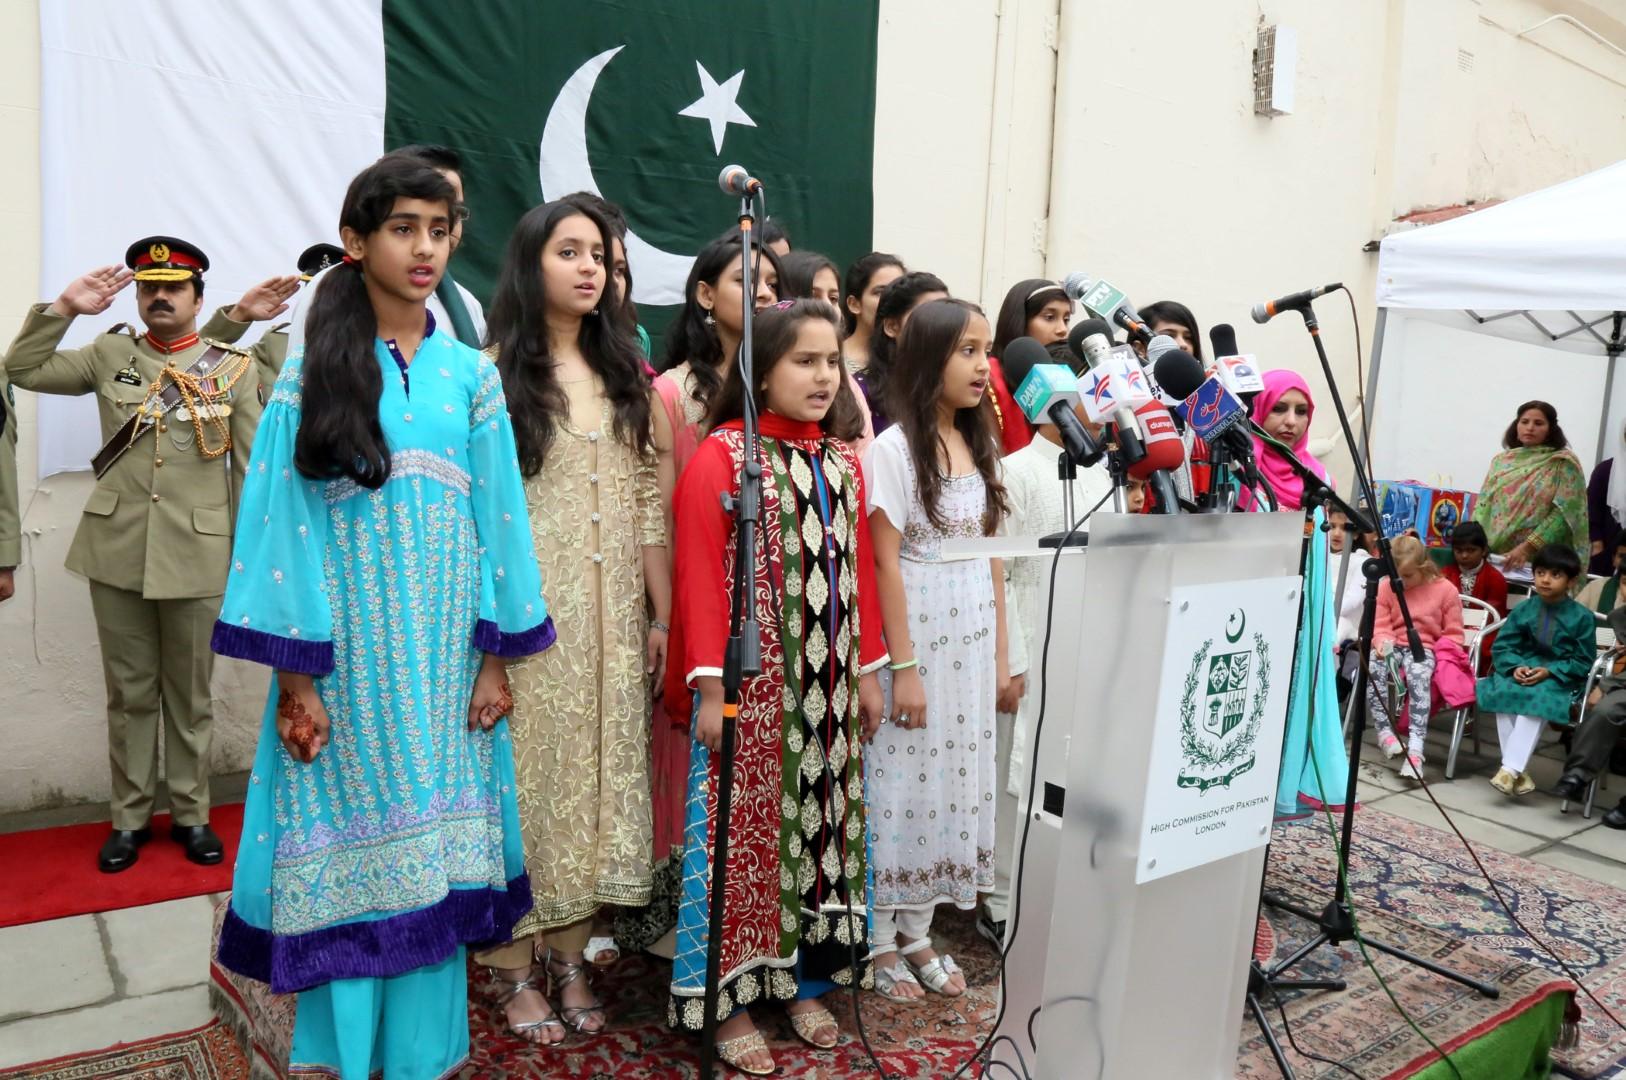 children sing the National Anthem